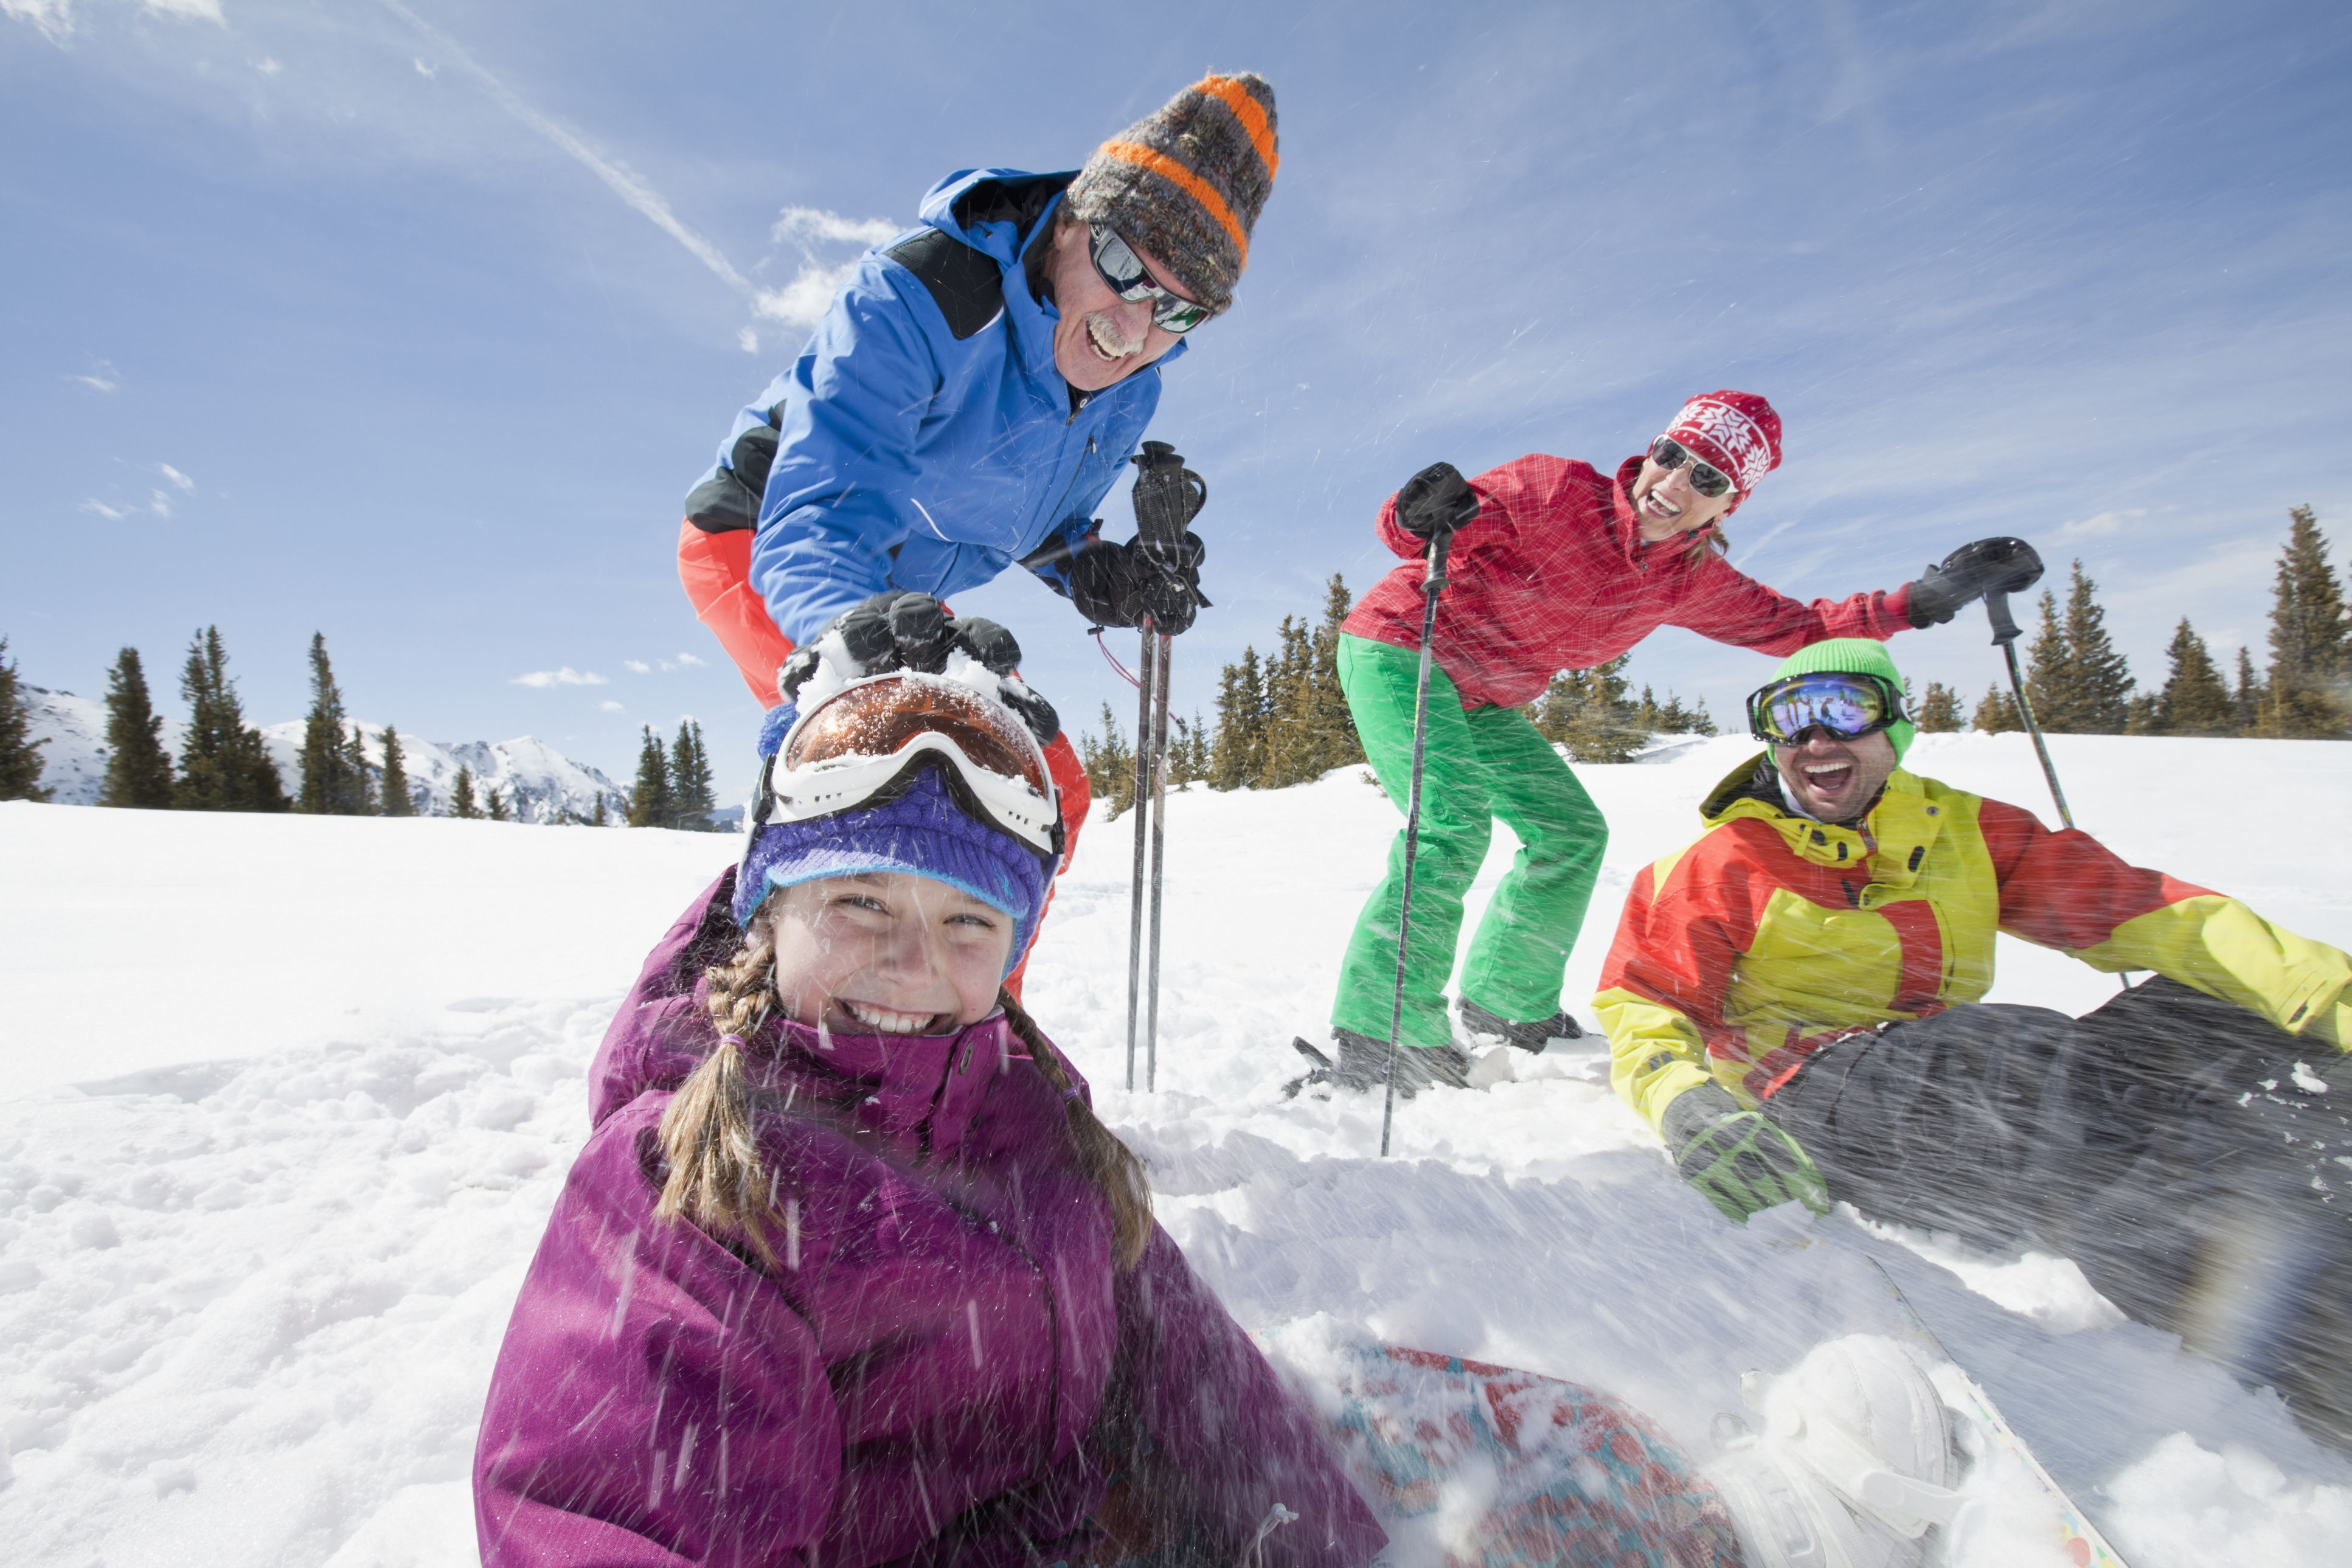 Top 5 Ski Resorts in America Revealed - WORLD PROPERTY